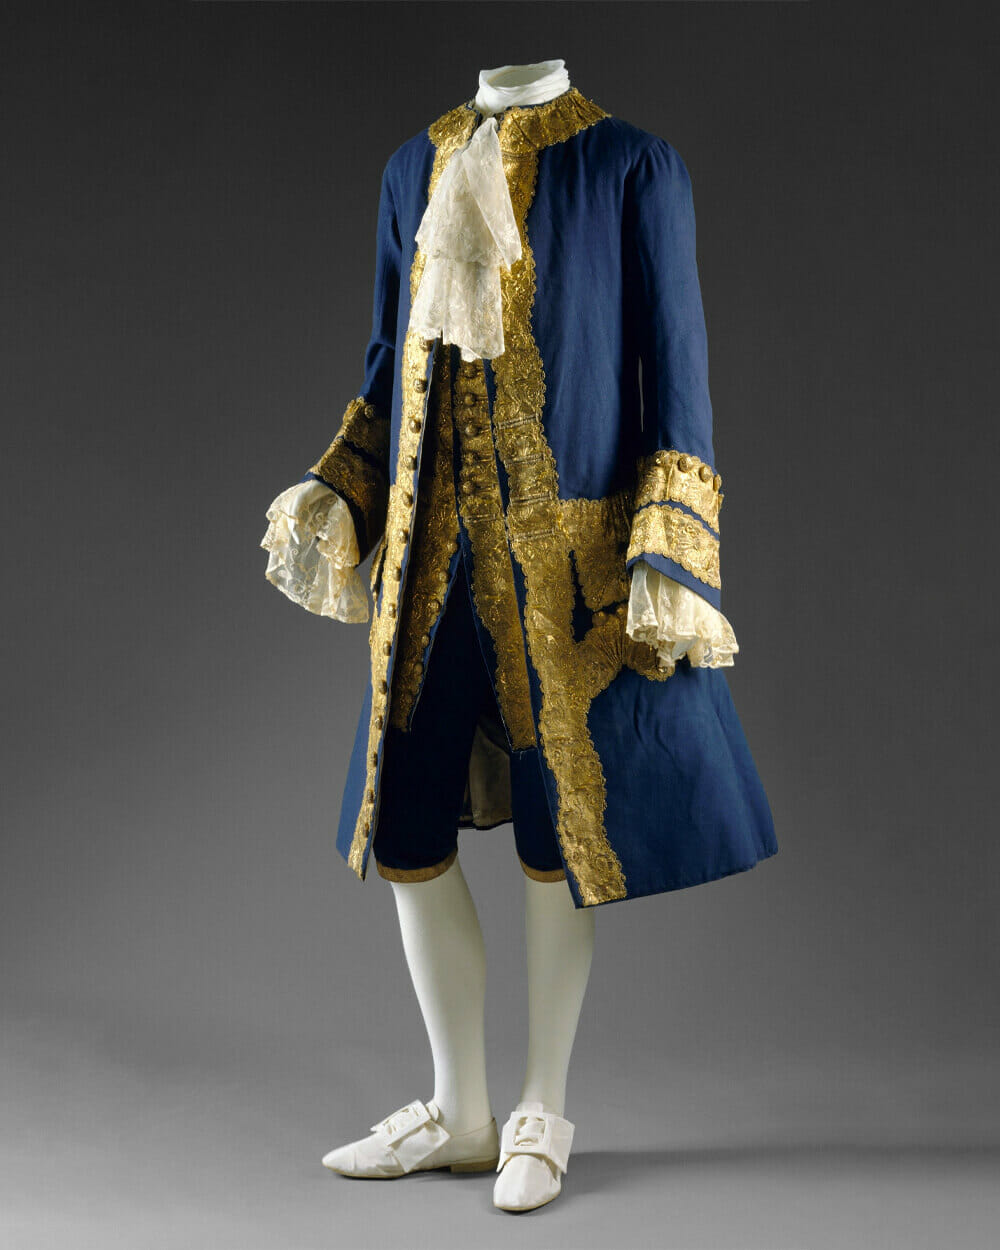 Men dress for aristocratic class